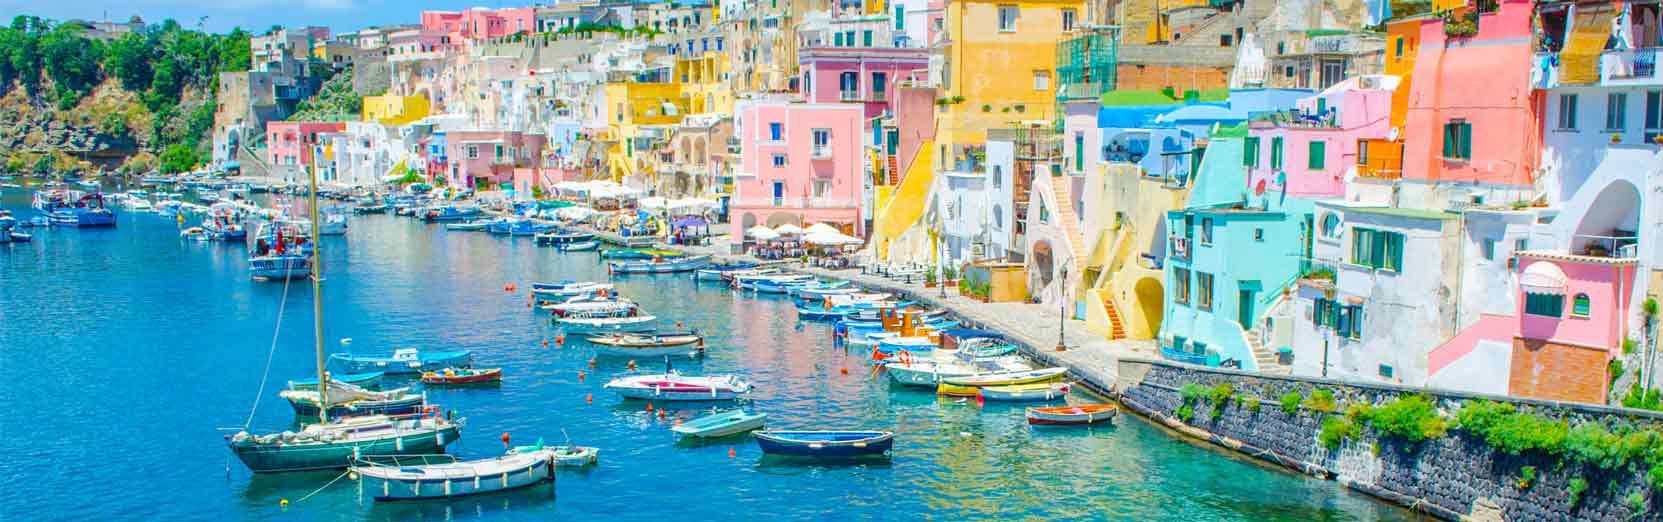 Autovermietung in Italien - jetzt Auto mieten